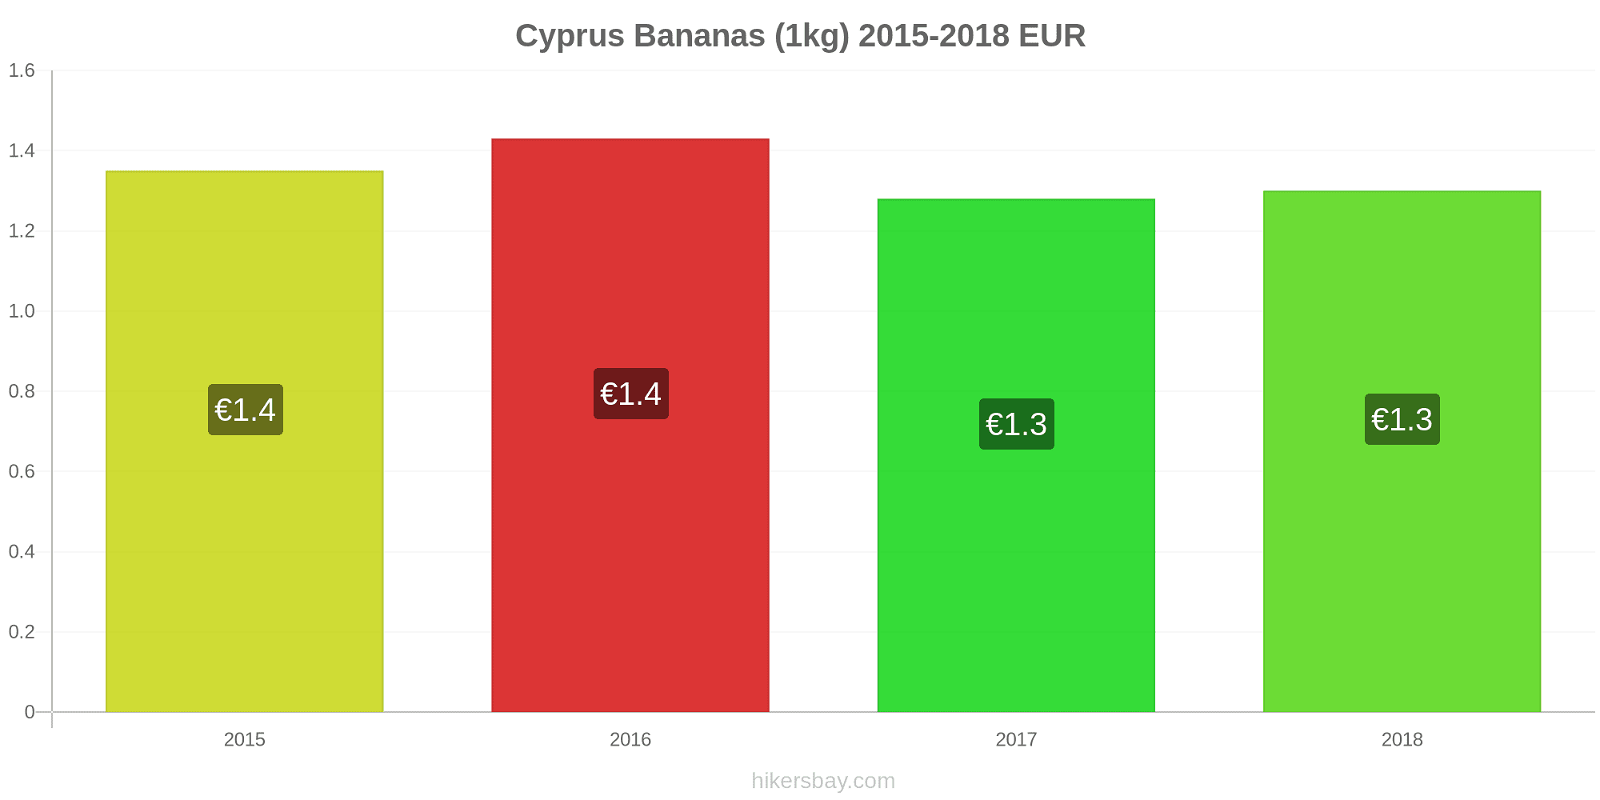 Cyprus price changes Bananas (1kg) hikersbay.com